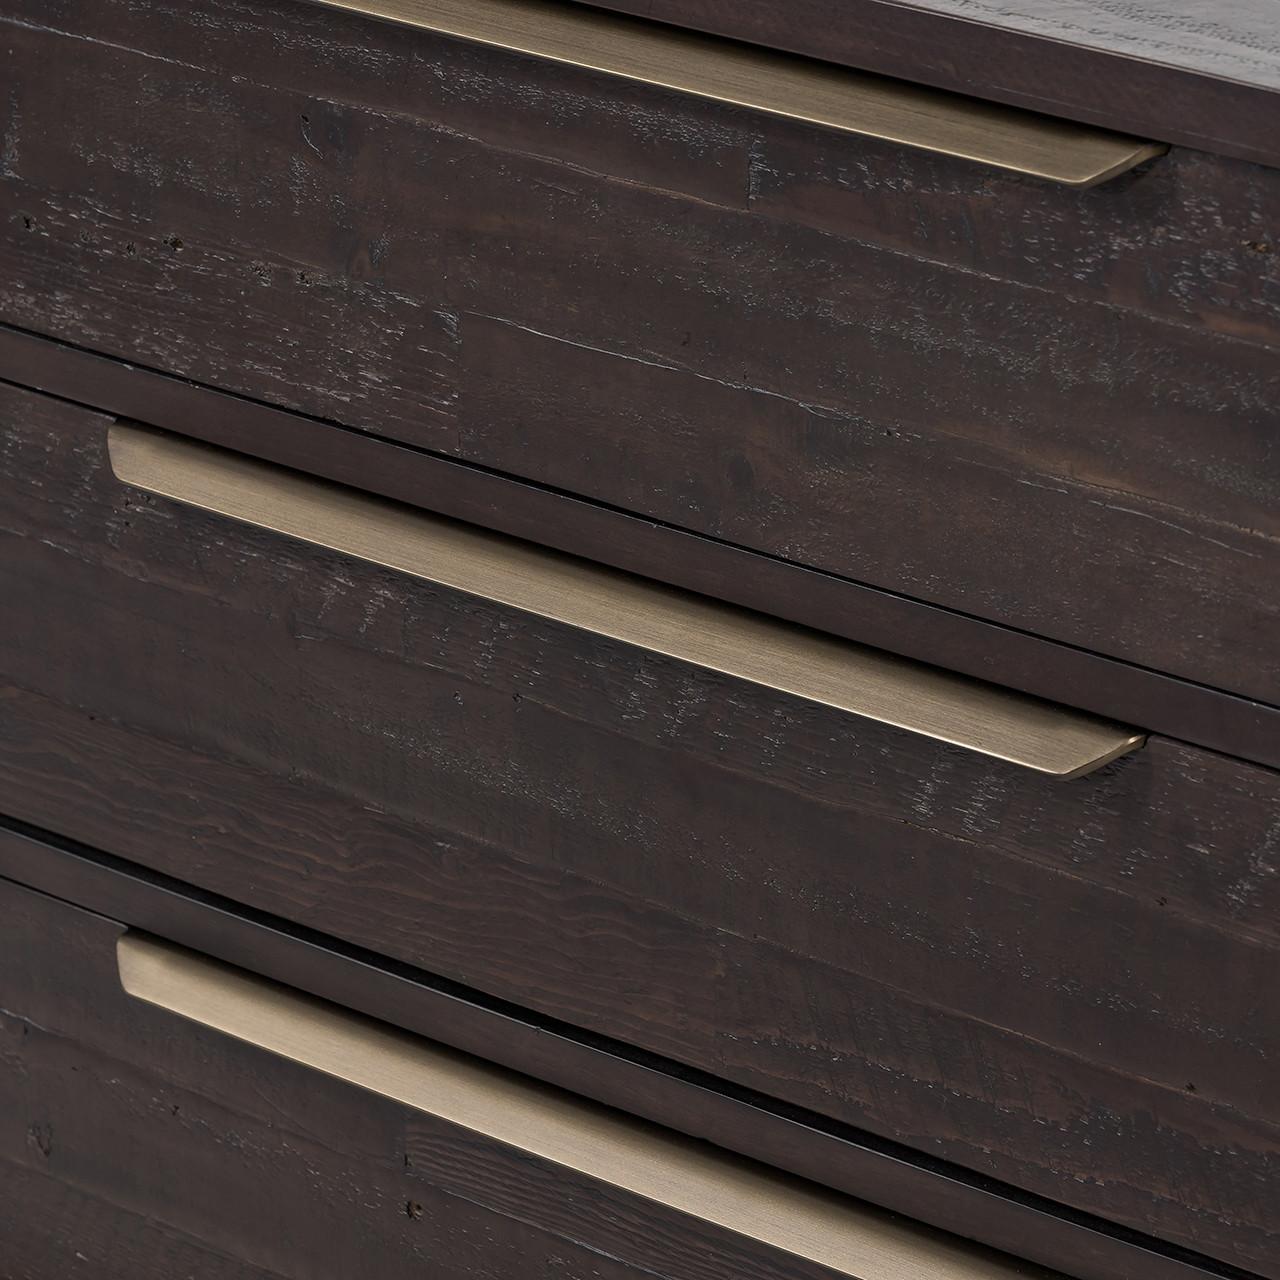 Seoul 6 Drawer Dresser - Dark Carbon